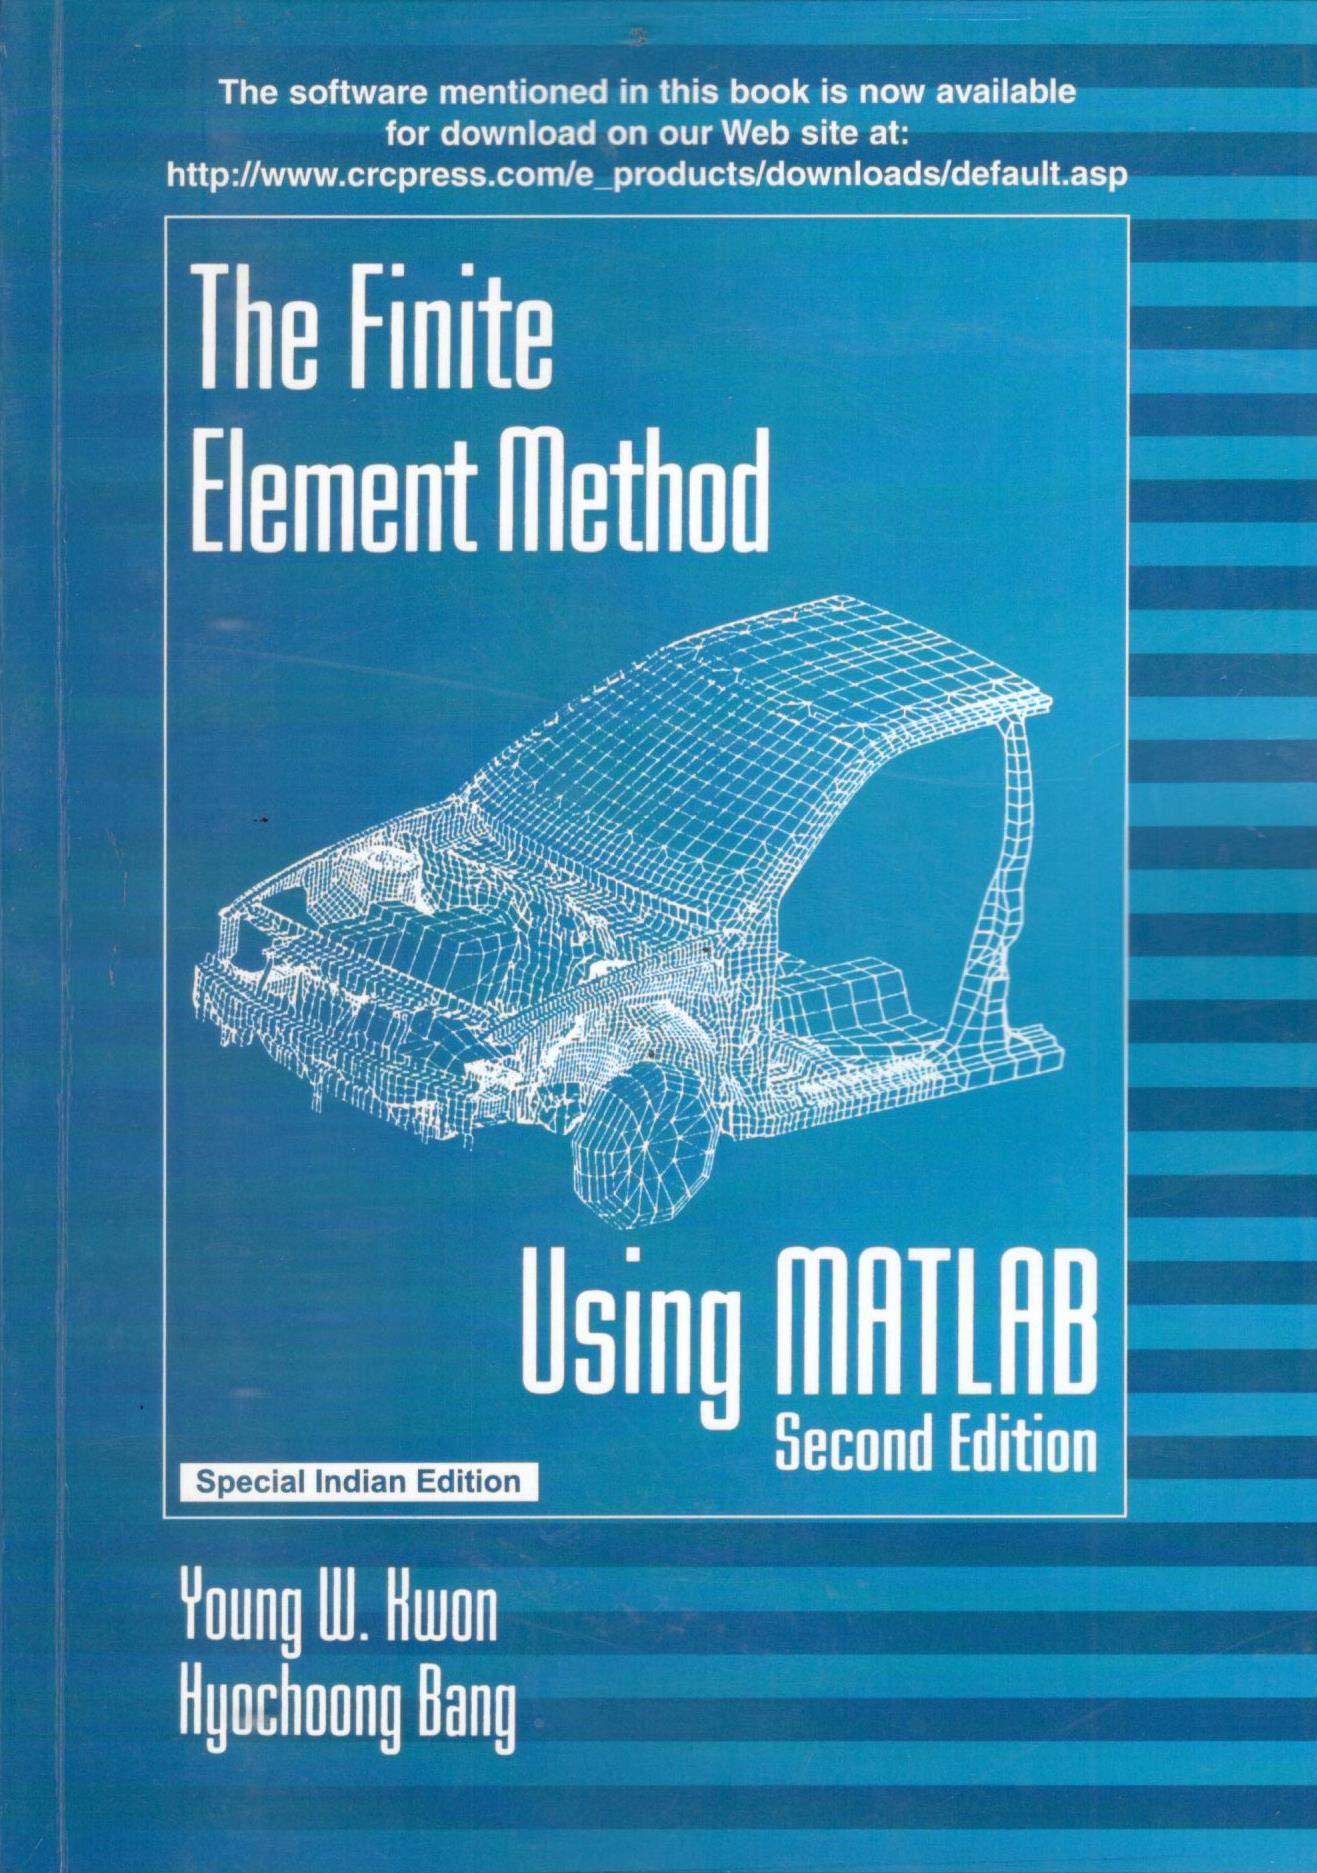 Finite Element Method Using Matlab 2Nd Ed.: Hyochoong Bang Young W . Kwon:  9781138386013: Books - Amazon.ca